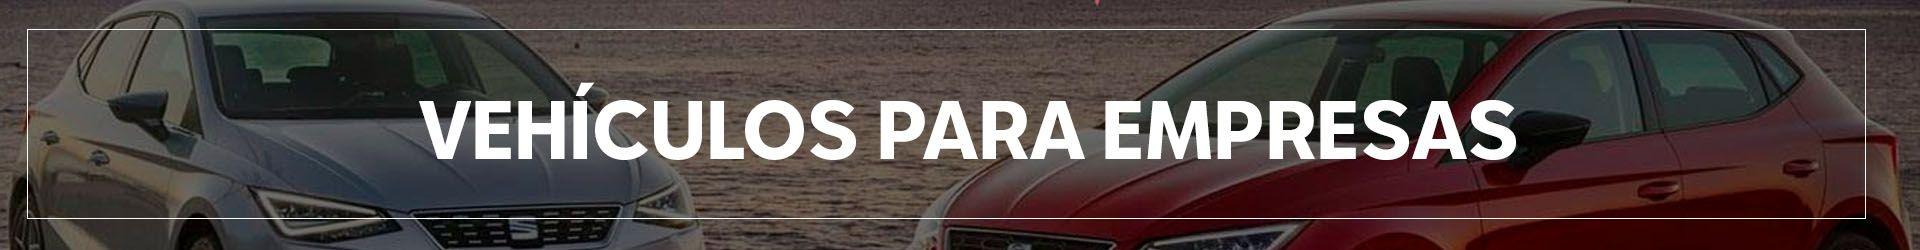 vehiculos para empresas coches Seat en Cádiz